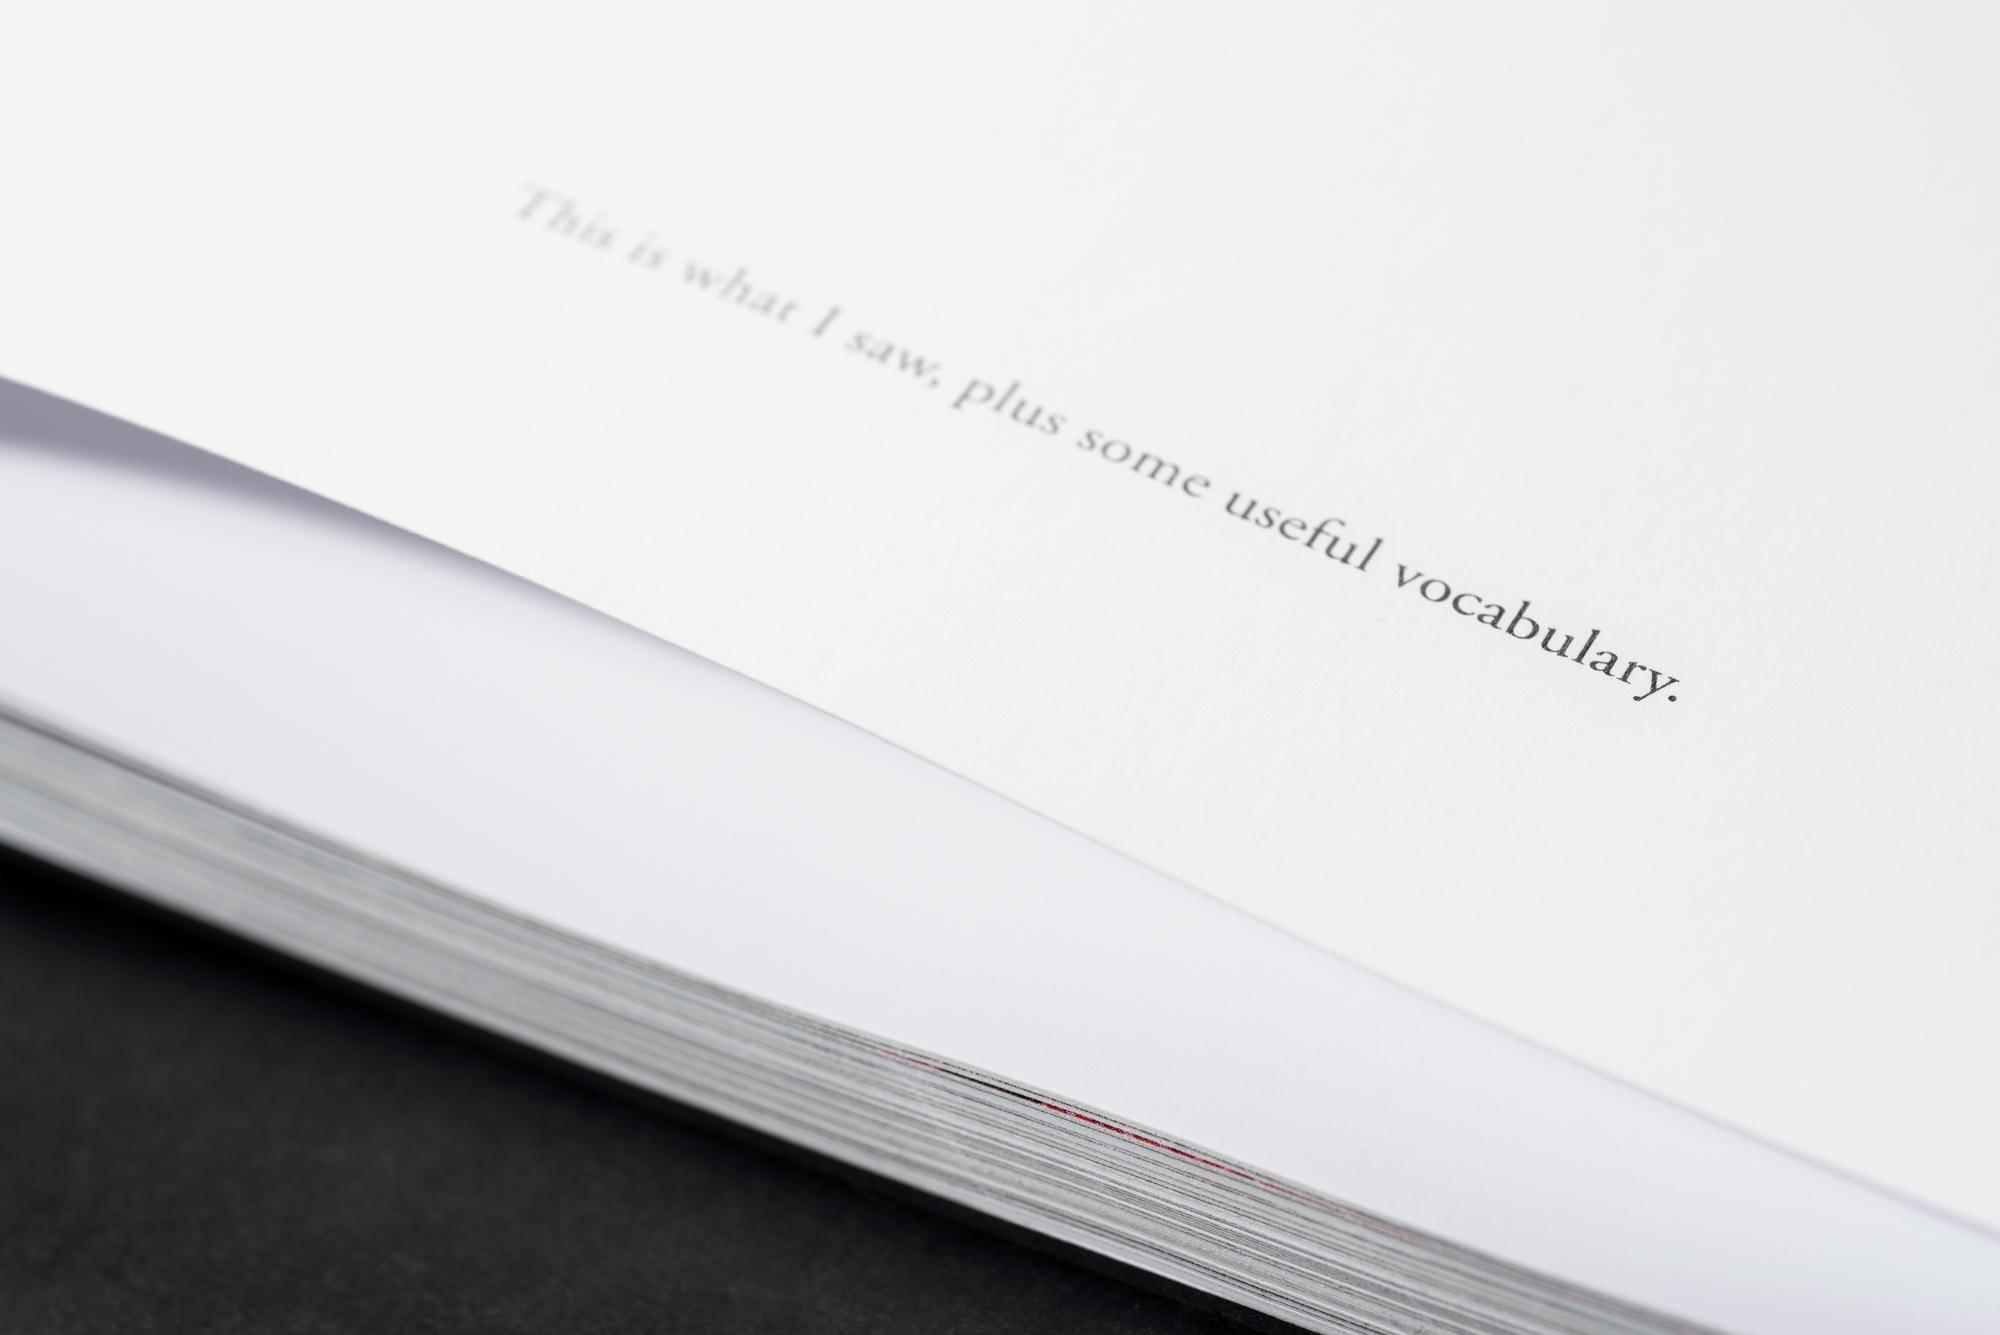 Adobe Garamond font on IGEPA Profibulk 1,1 (150 g/m  2  ) paper